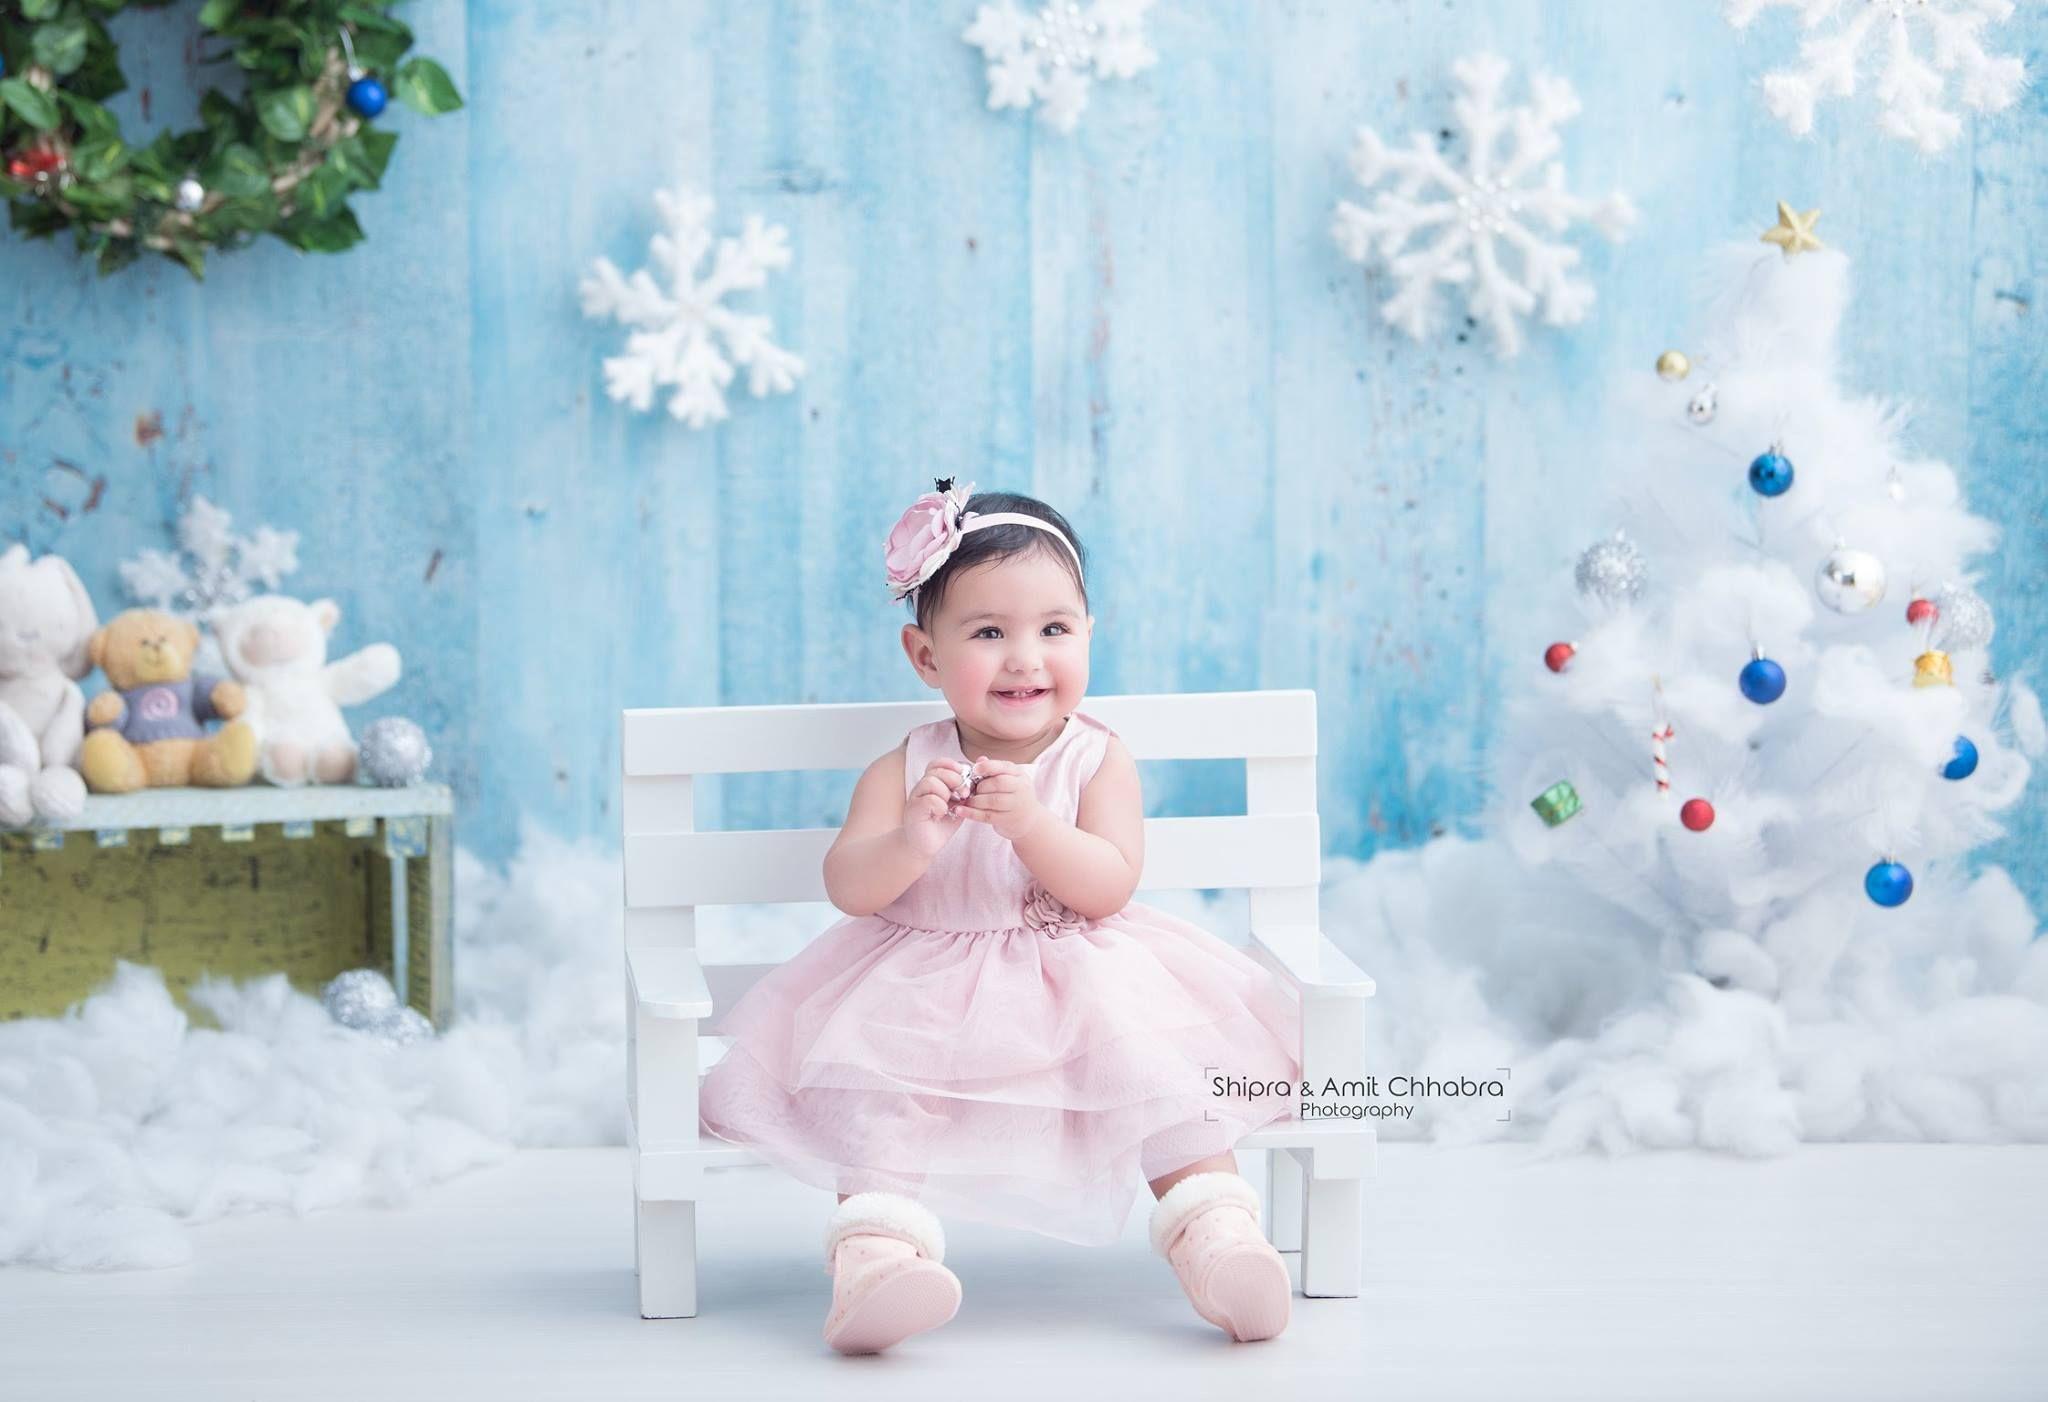 Snowflakes snow balls diy teddy bears baby girl photoshoot kids photographer creative ideas for photoshoot shipra amit chhabra photography